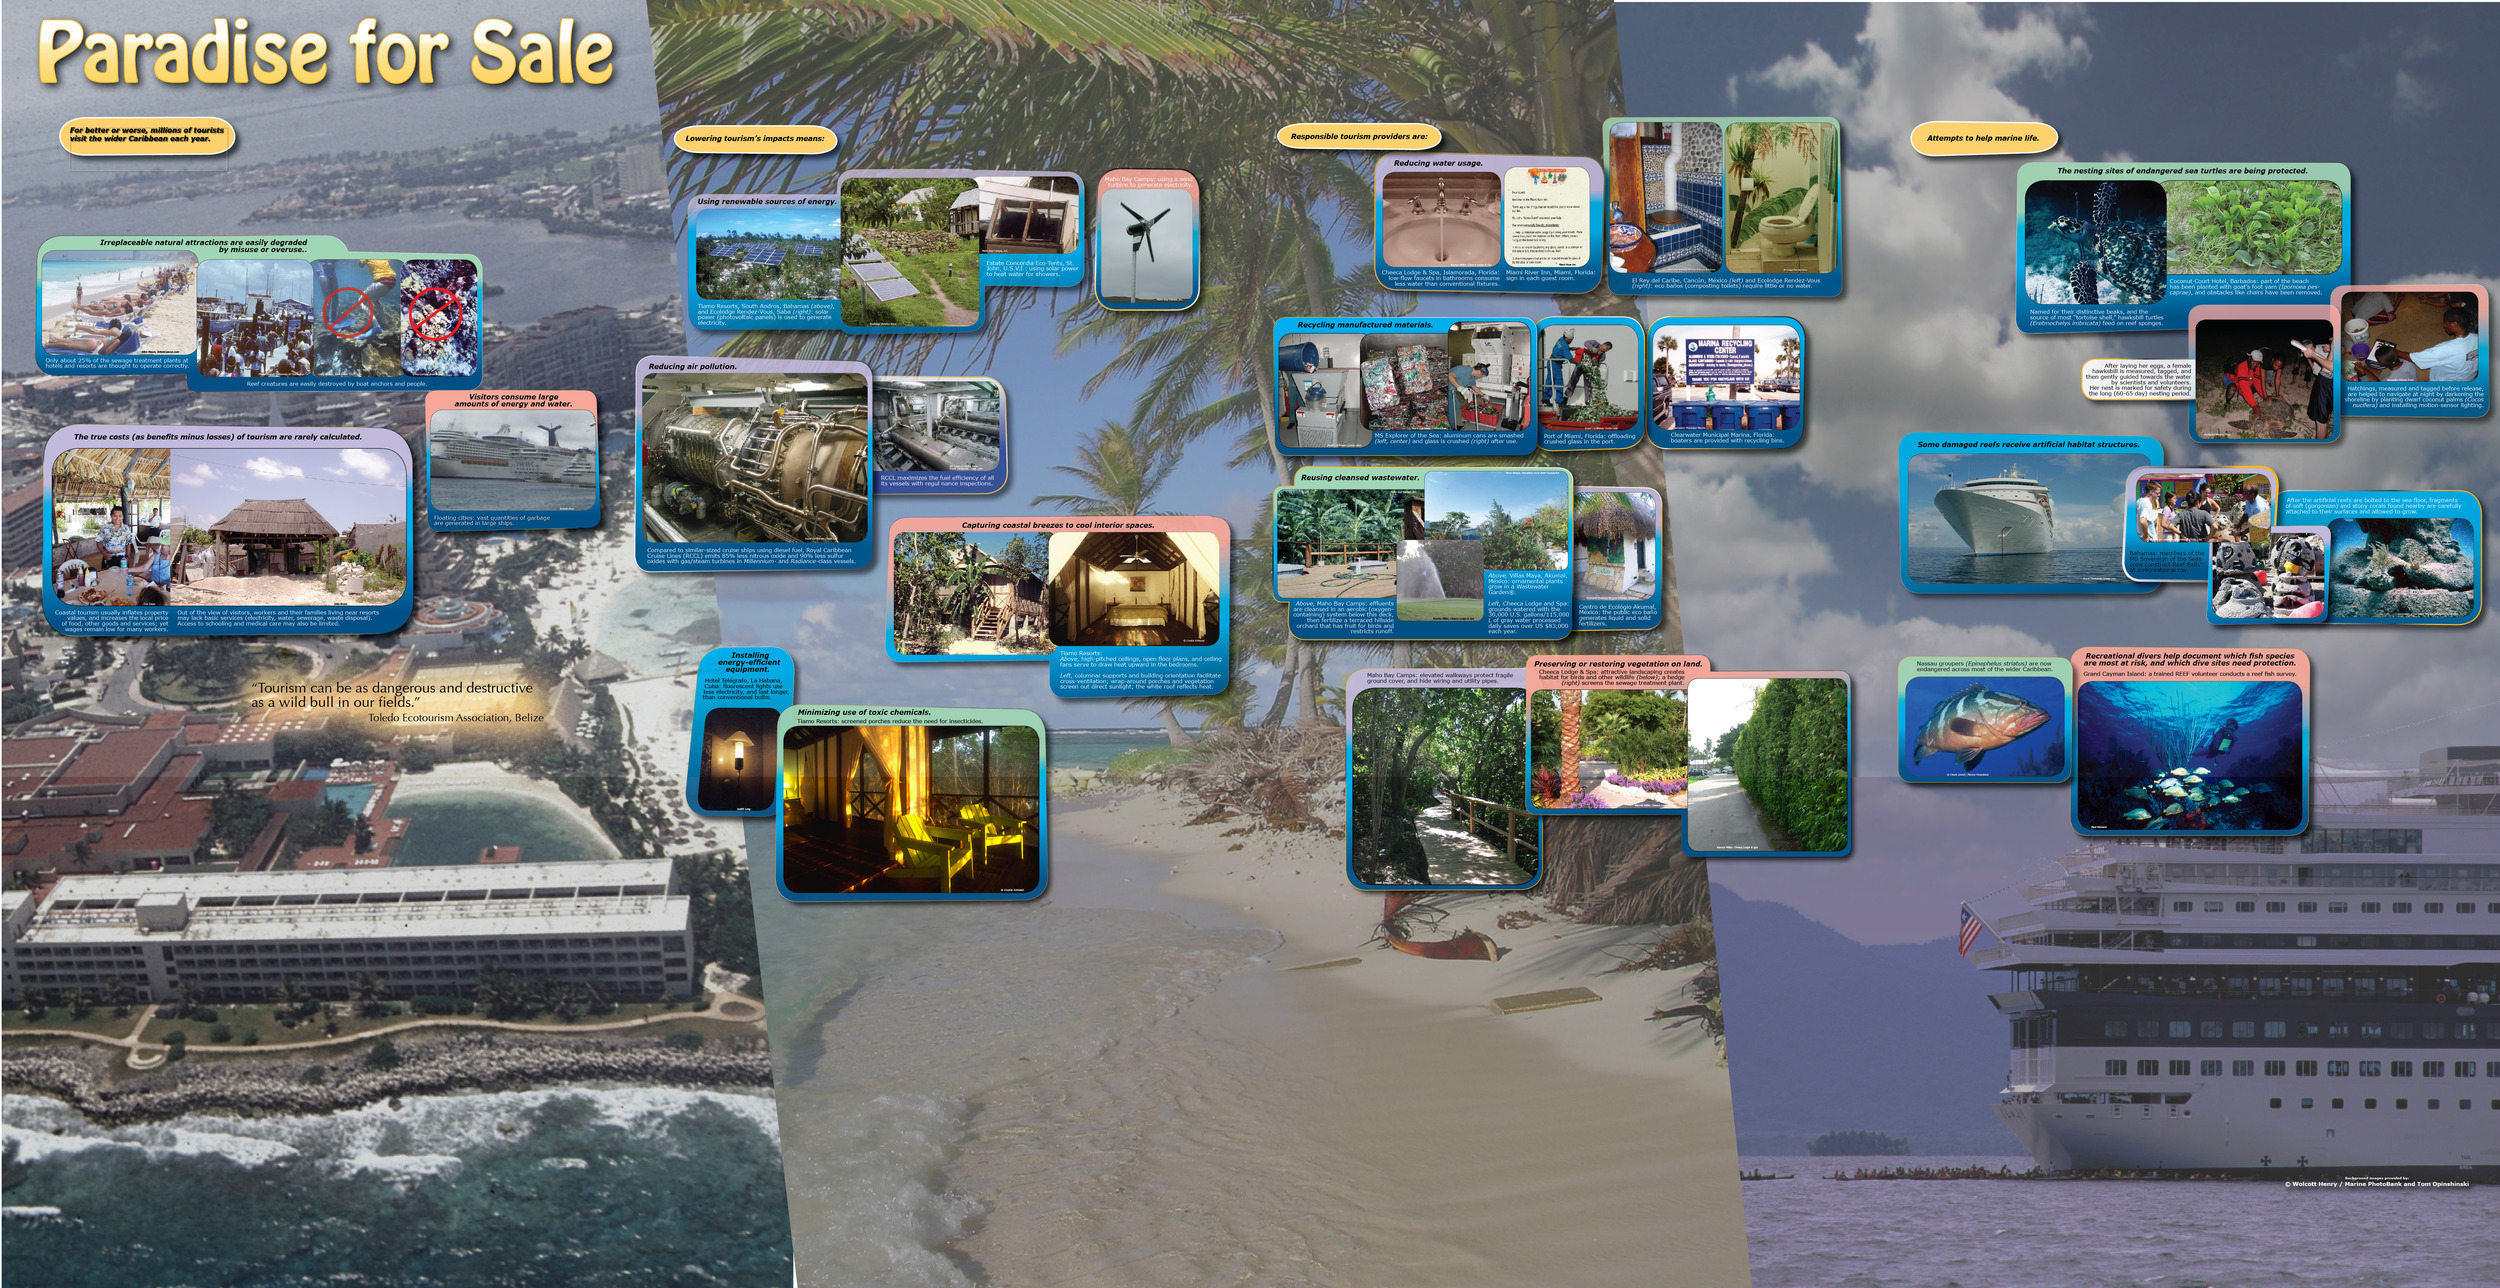 8-TOURISM-G3.jpg